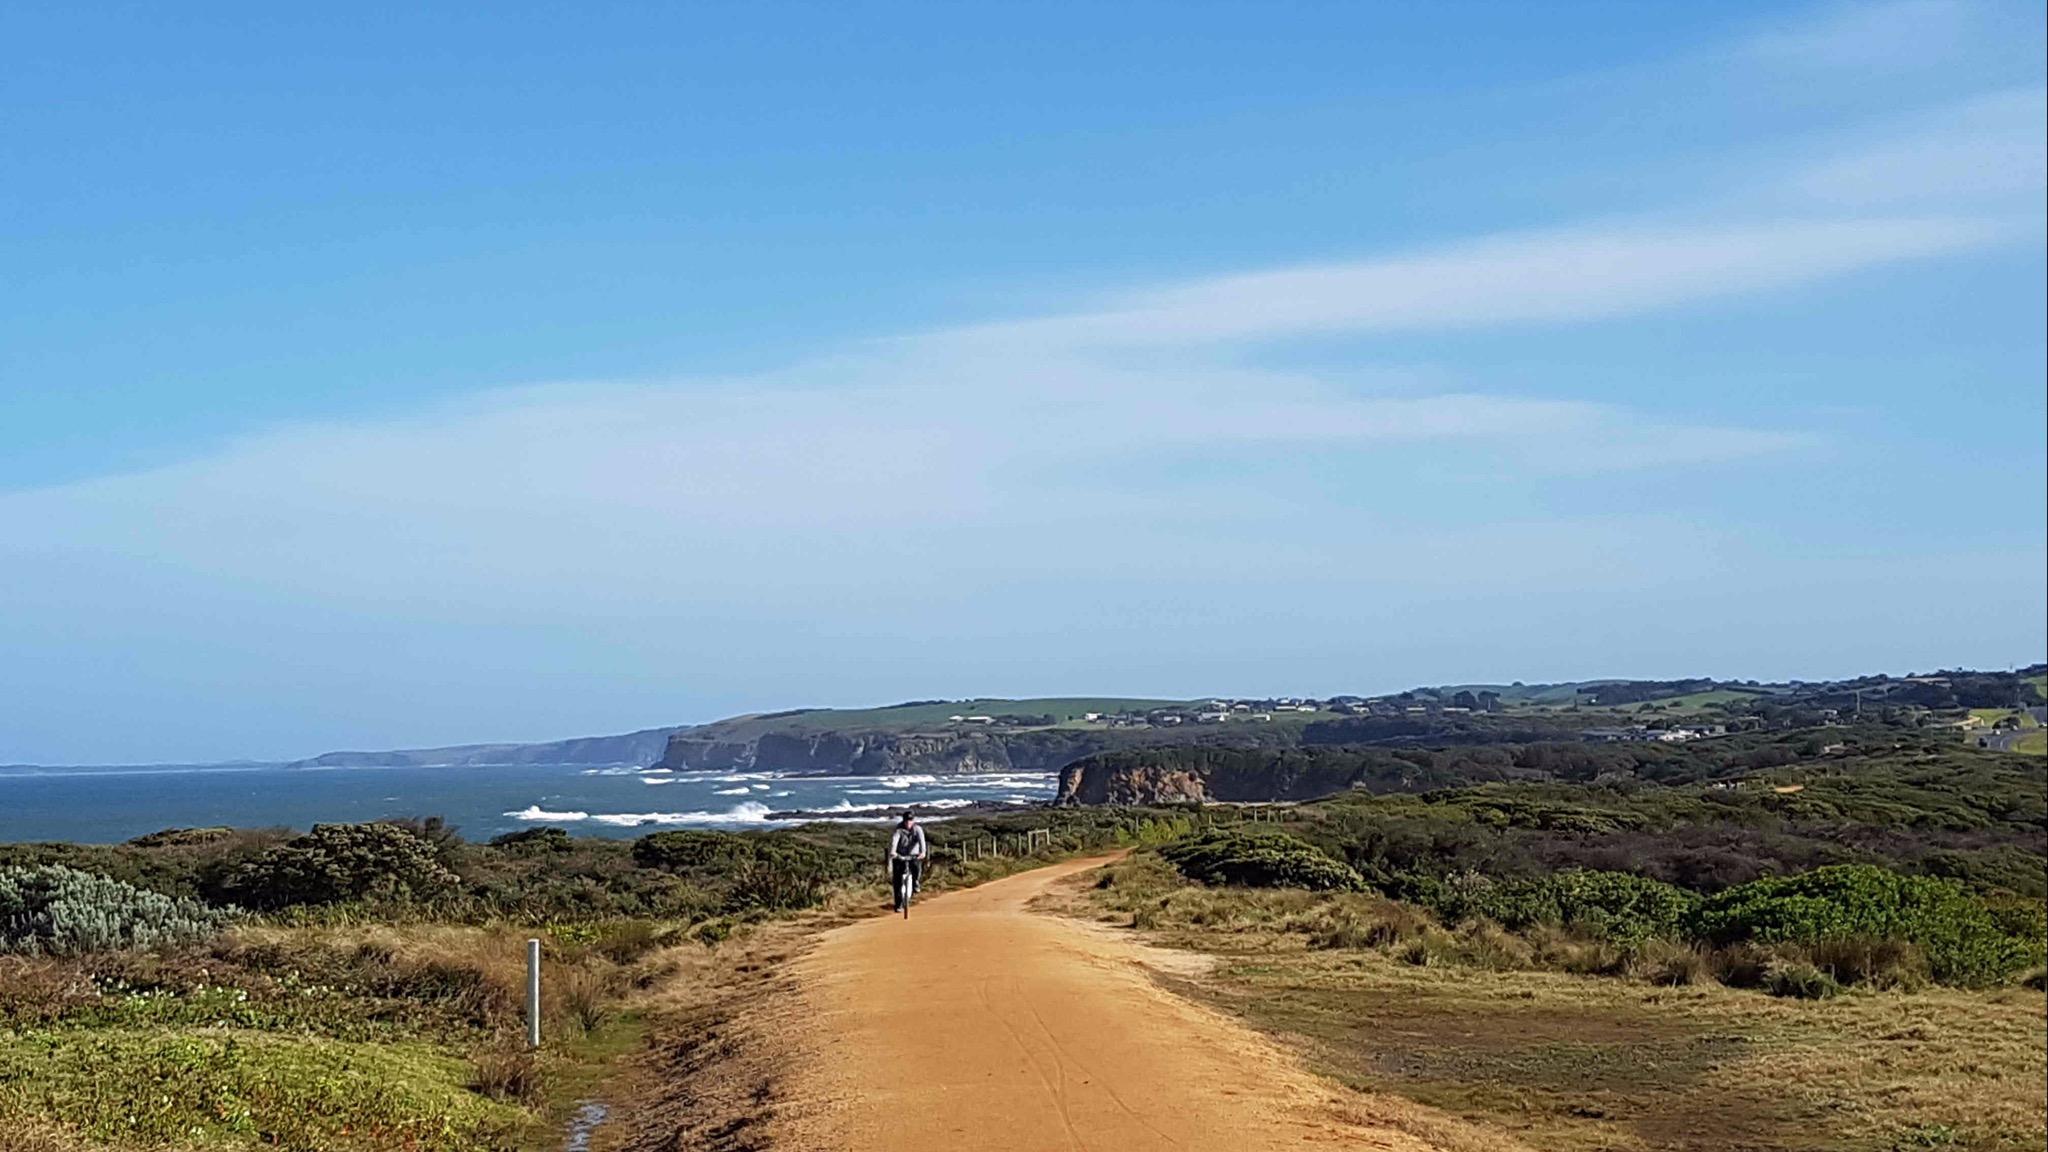 The Bass Coast Rail Trail is the only coastal rail trail in Australia